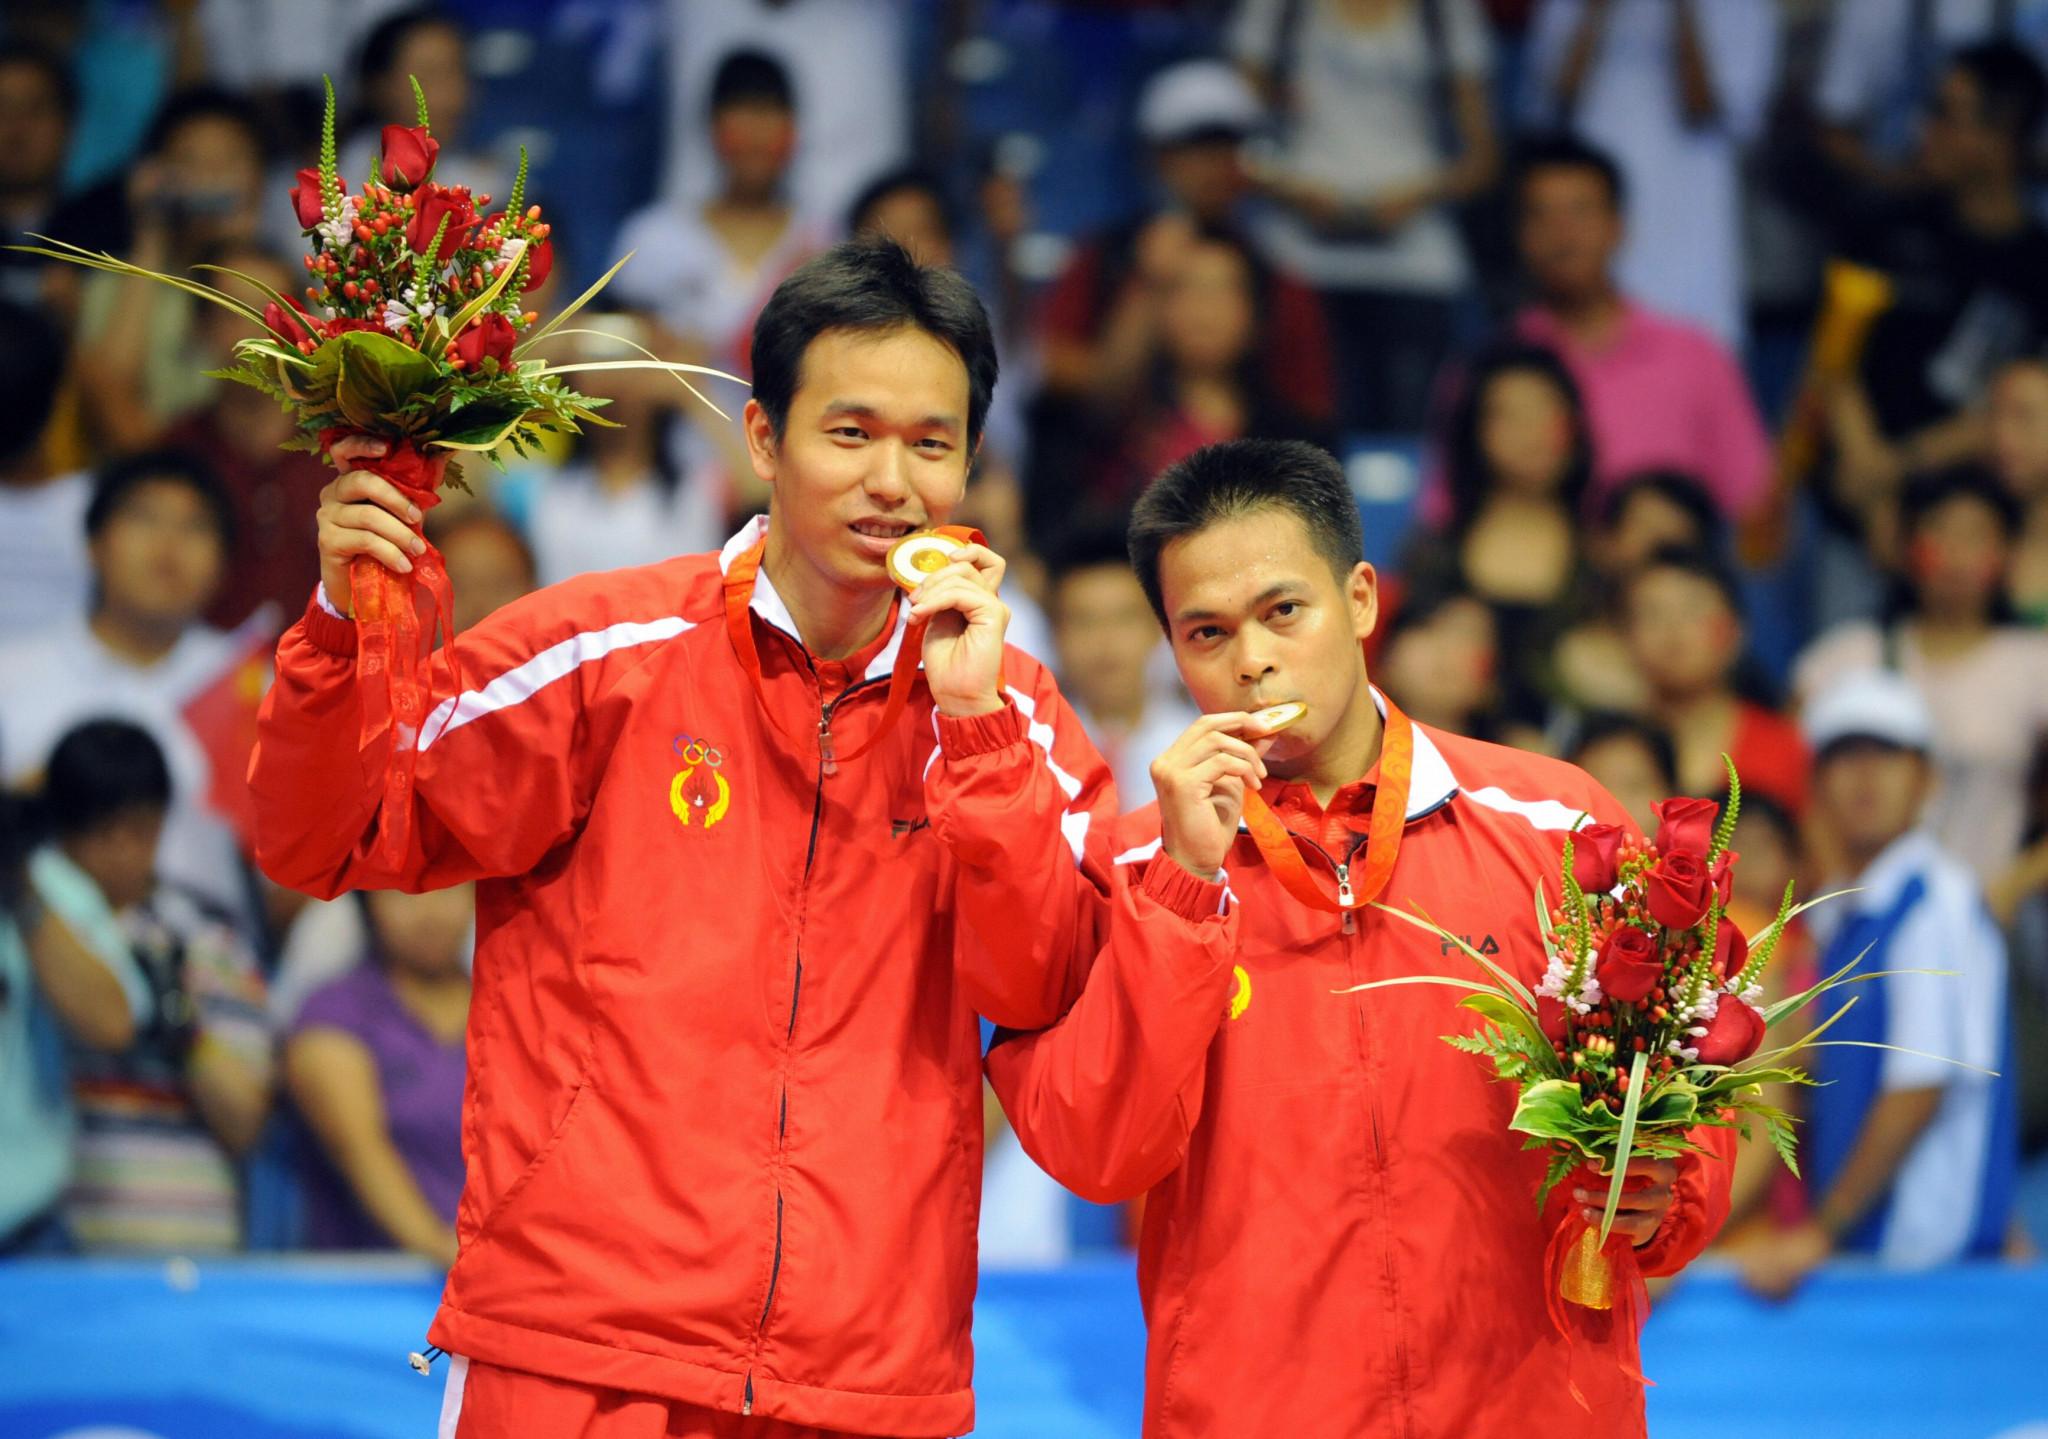 Hendra Setiawan described doubles partner Markis Kido as an